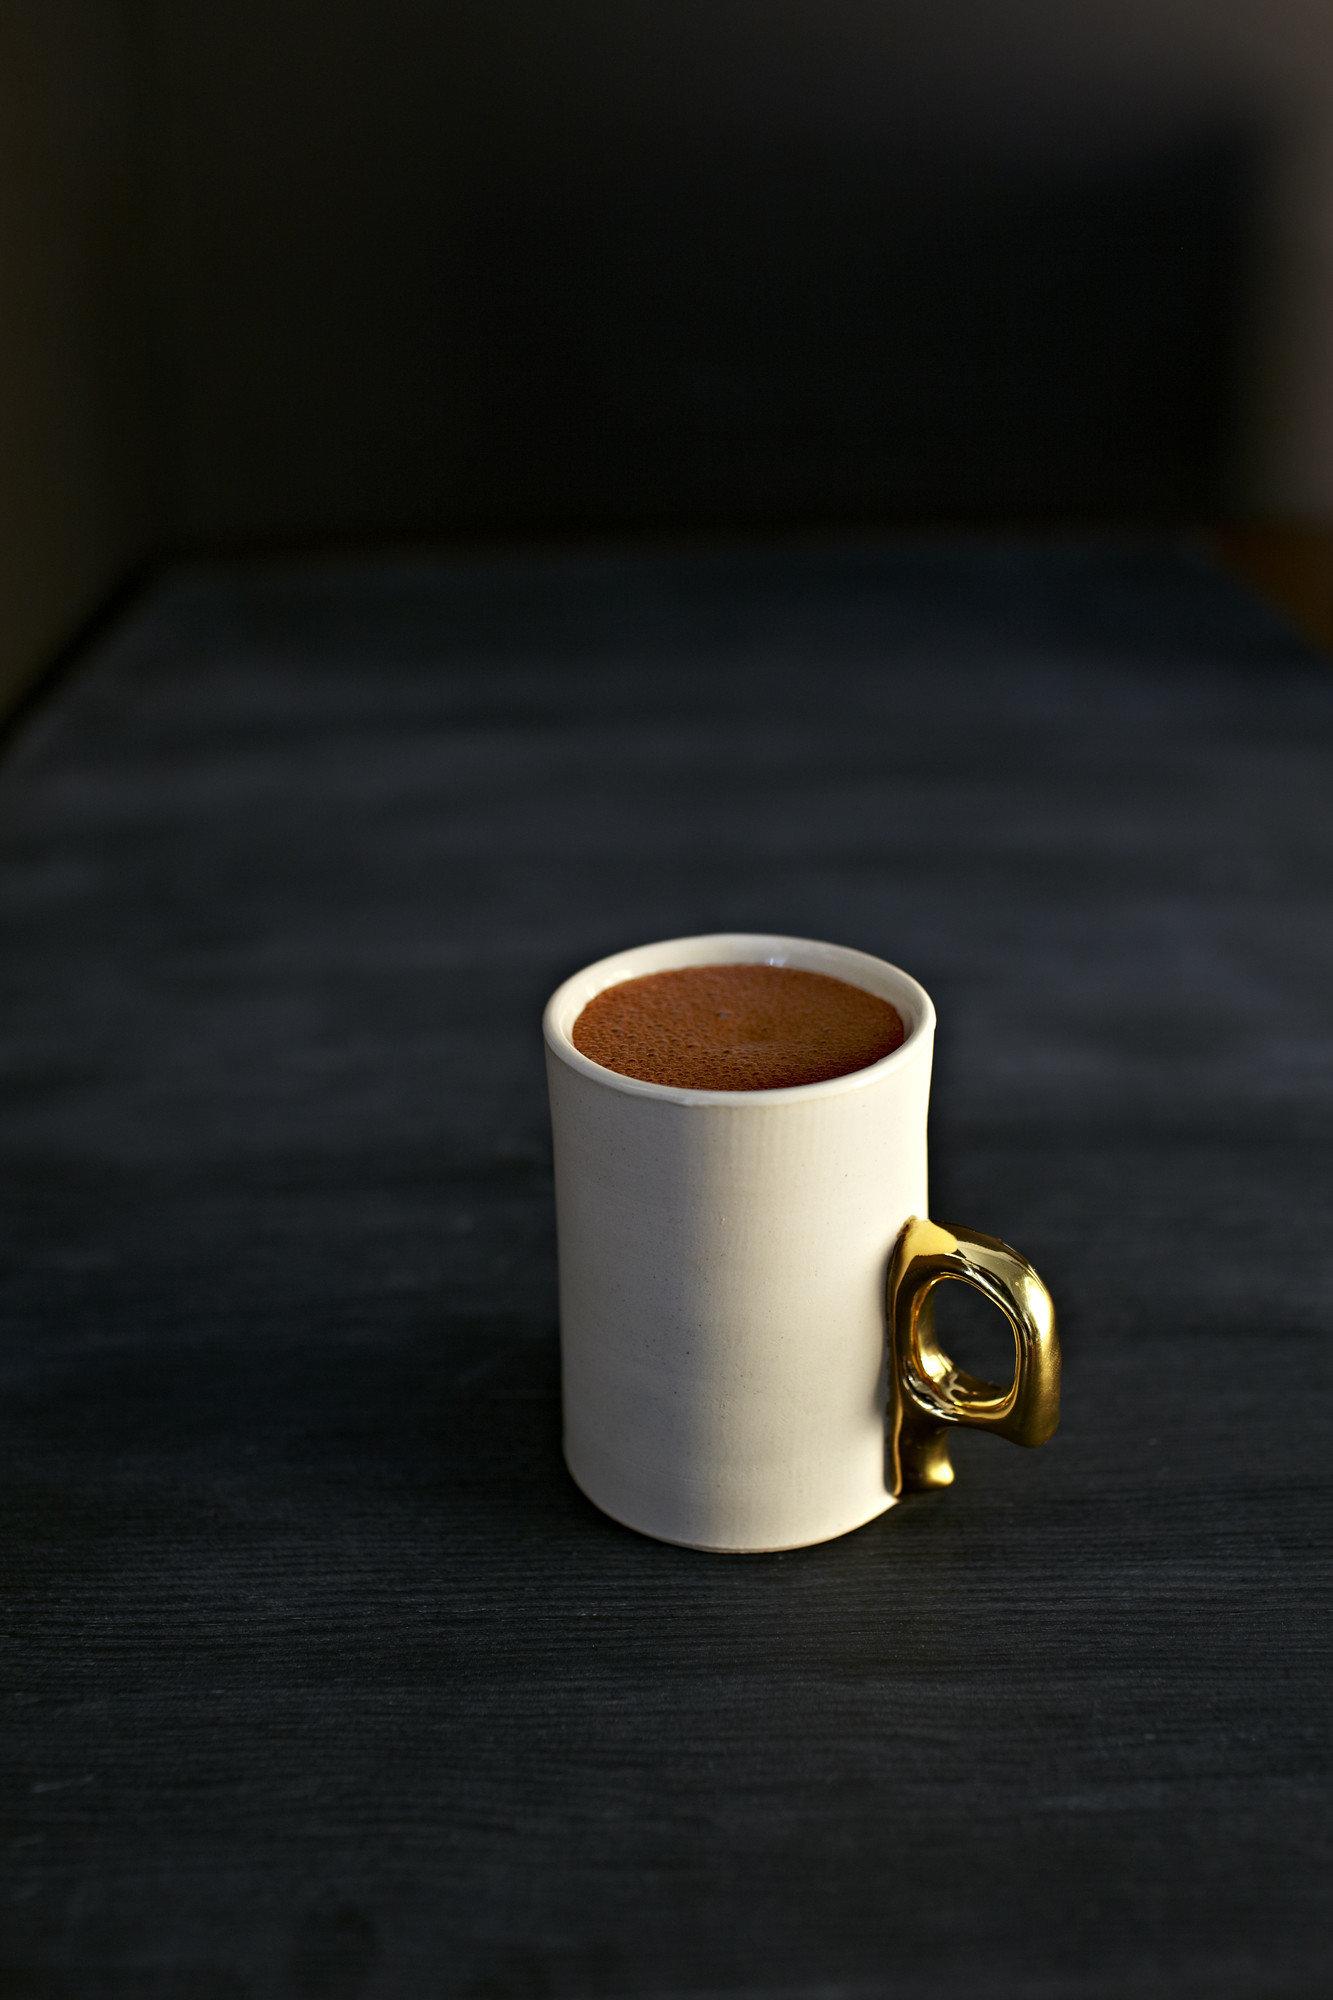 Food + Drink cup coffee sitting indoor coffee cup Drink beverage lighting caffeine espresso shape ceramic drinkware